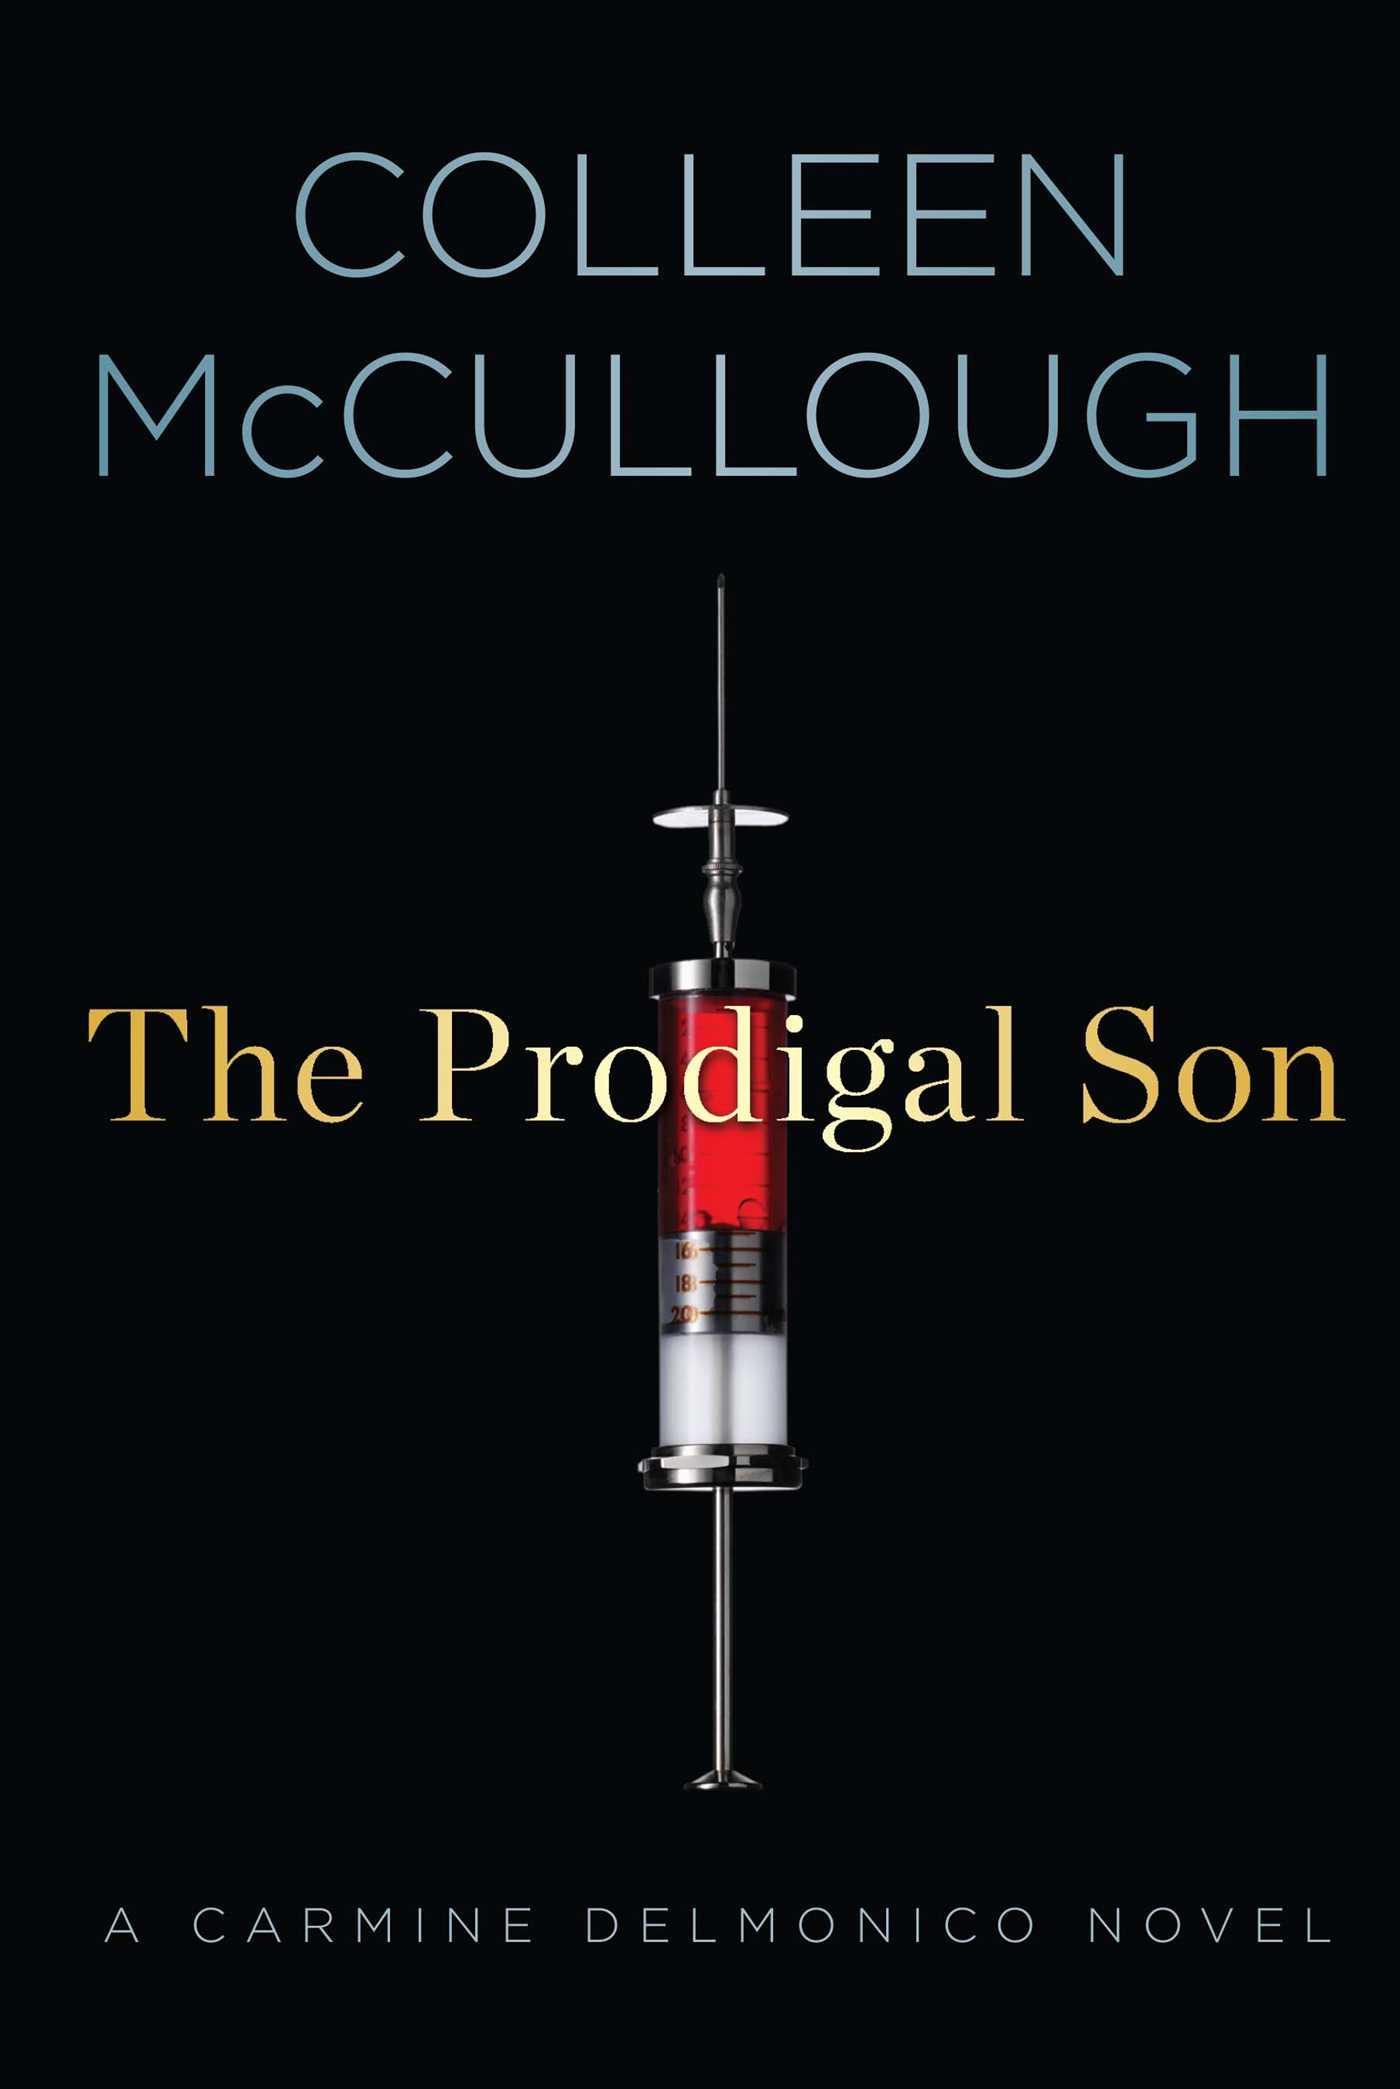 The prodigal son 9781451668773 hr